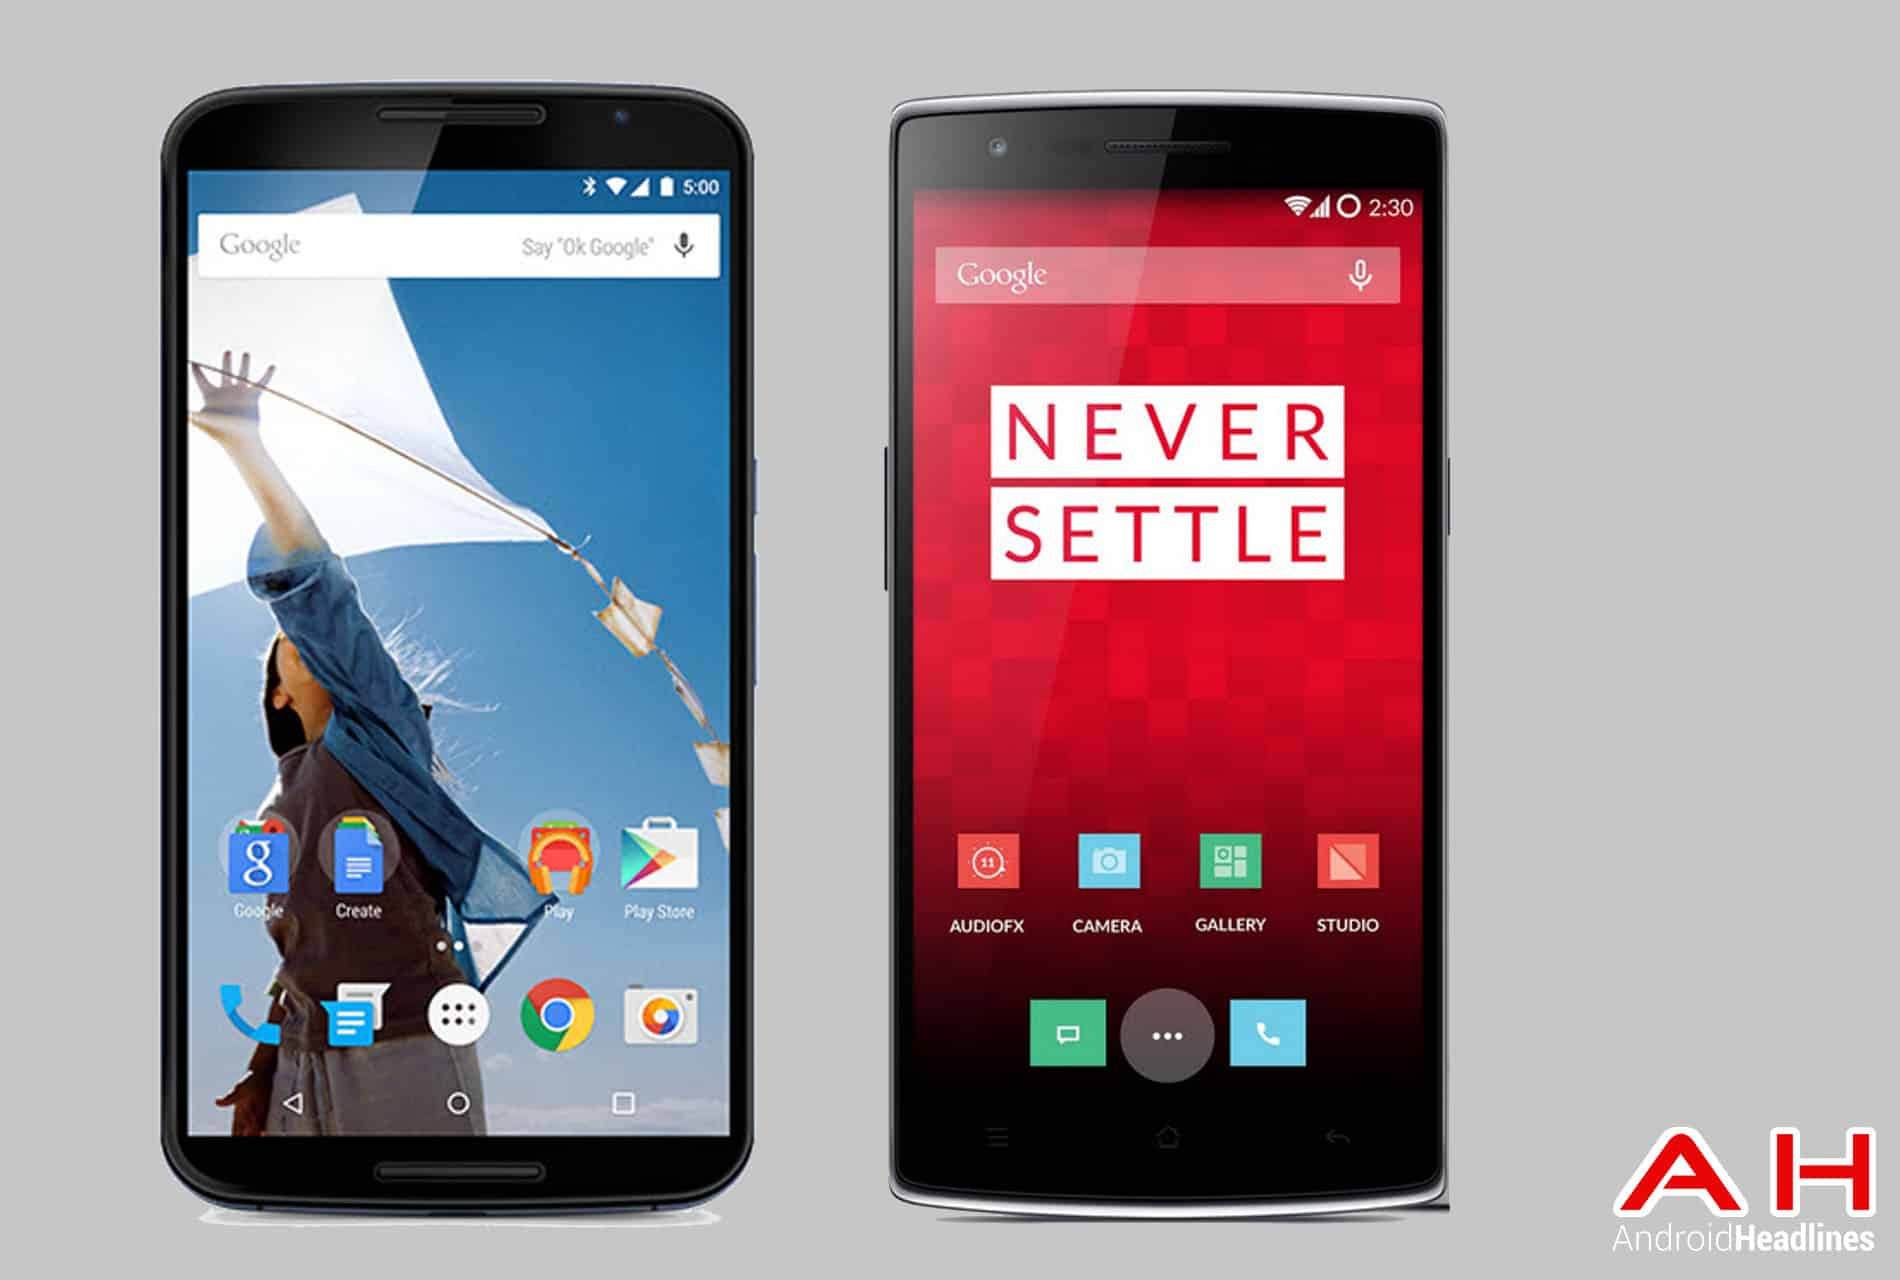 Phone Comparisons: Nexus 6 vs OnePlus One